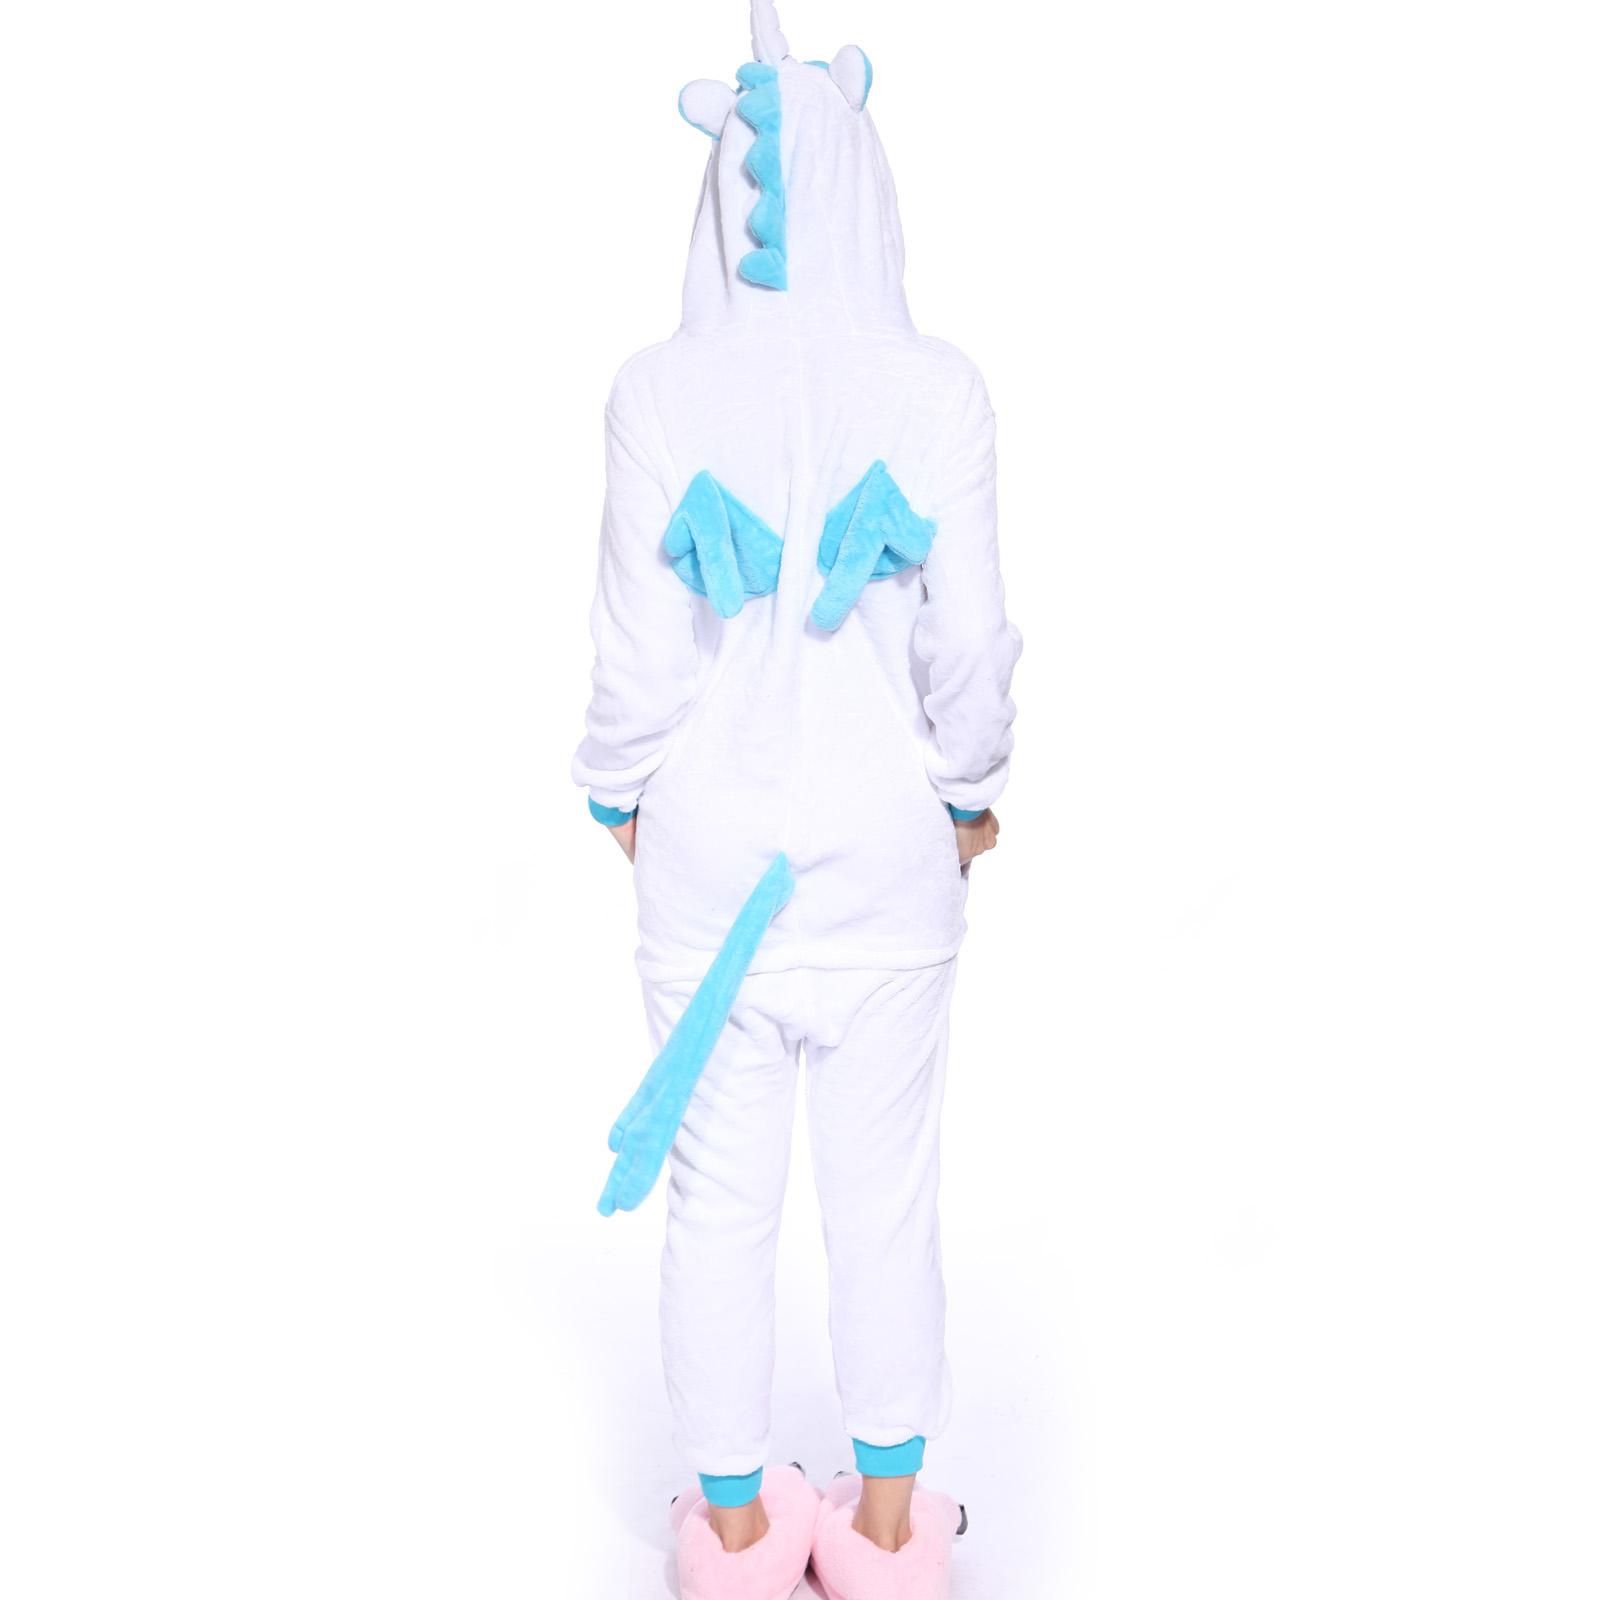 SurePromise Adults Unisex Animal Onesie Pajamas Cosplay Costume